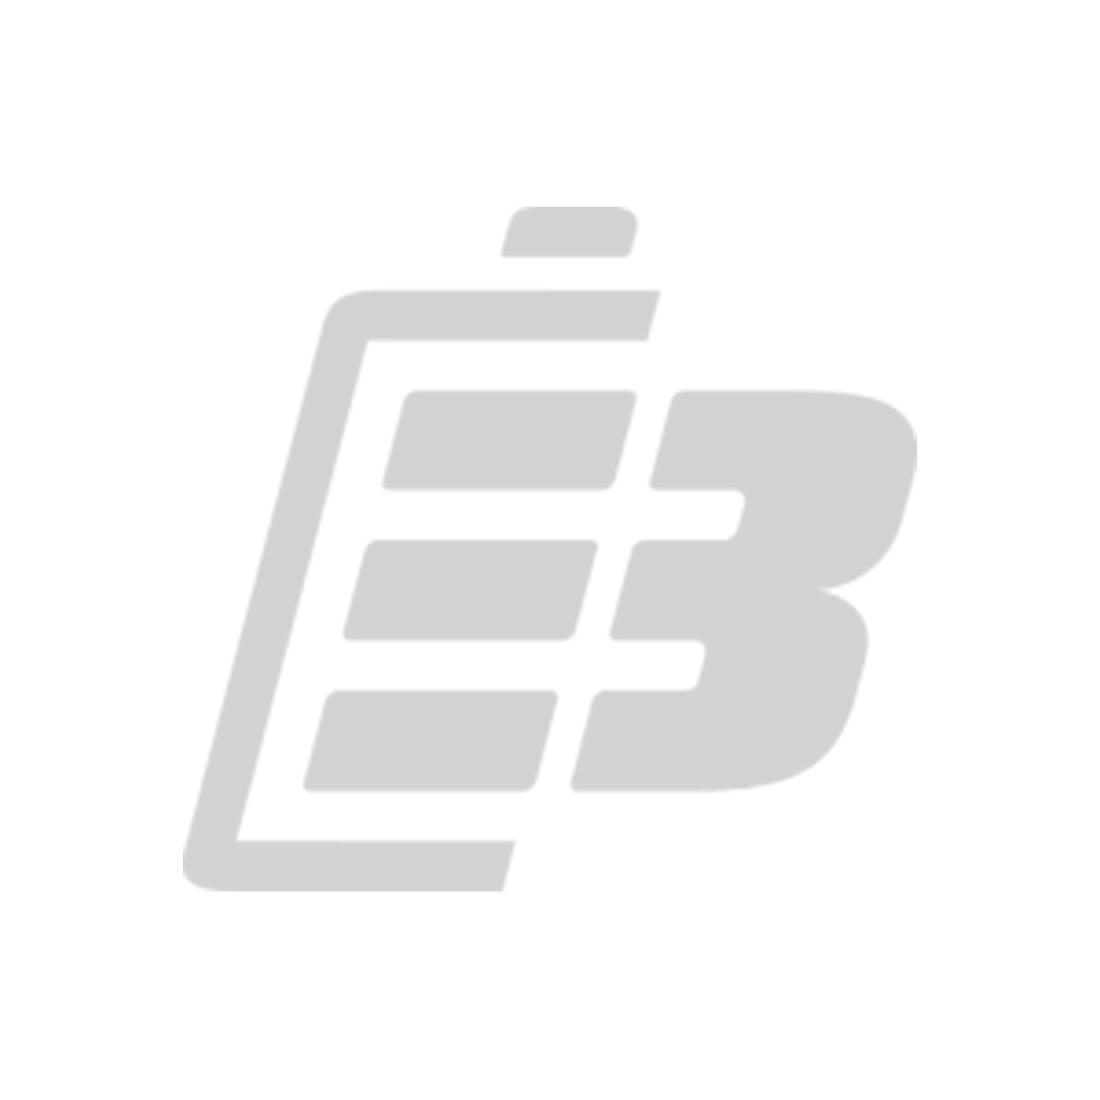 Cordless phone battery Grundig Calios 1_1